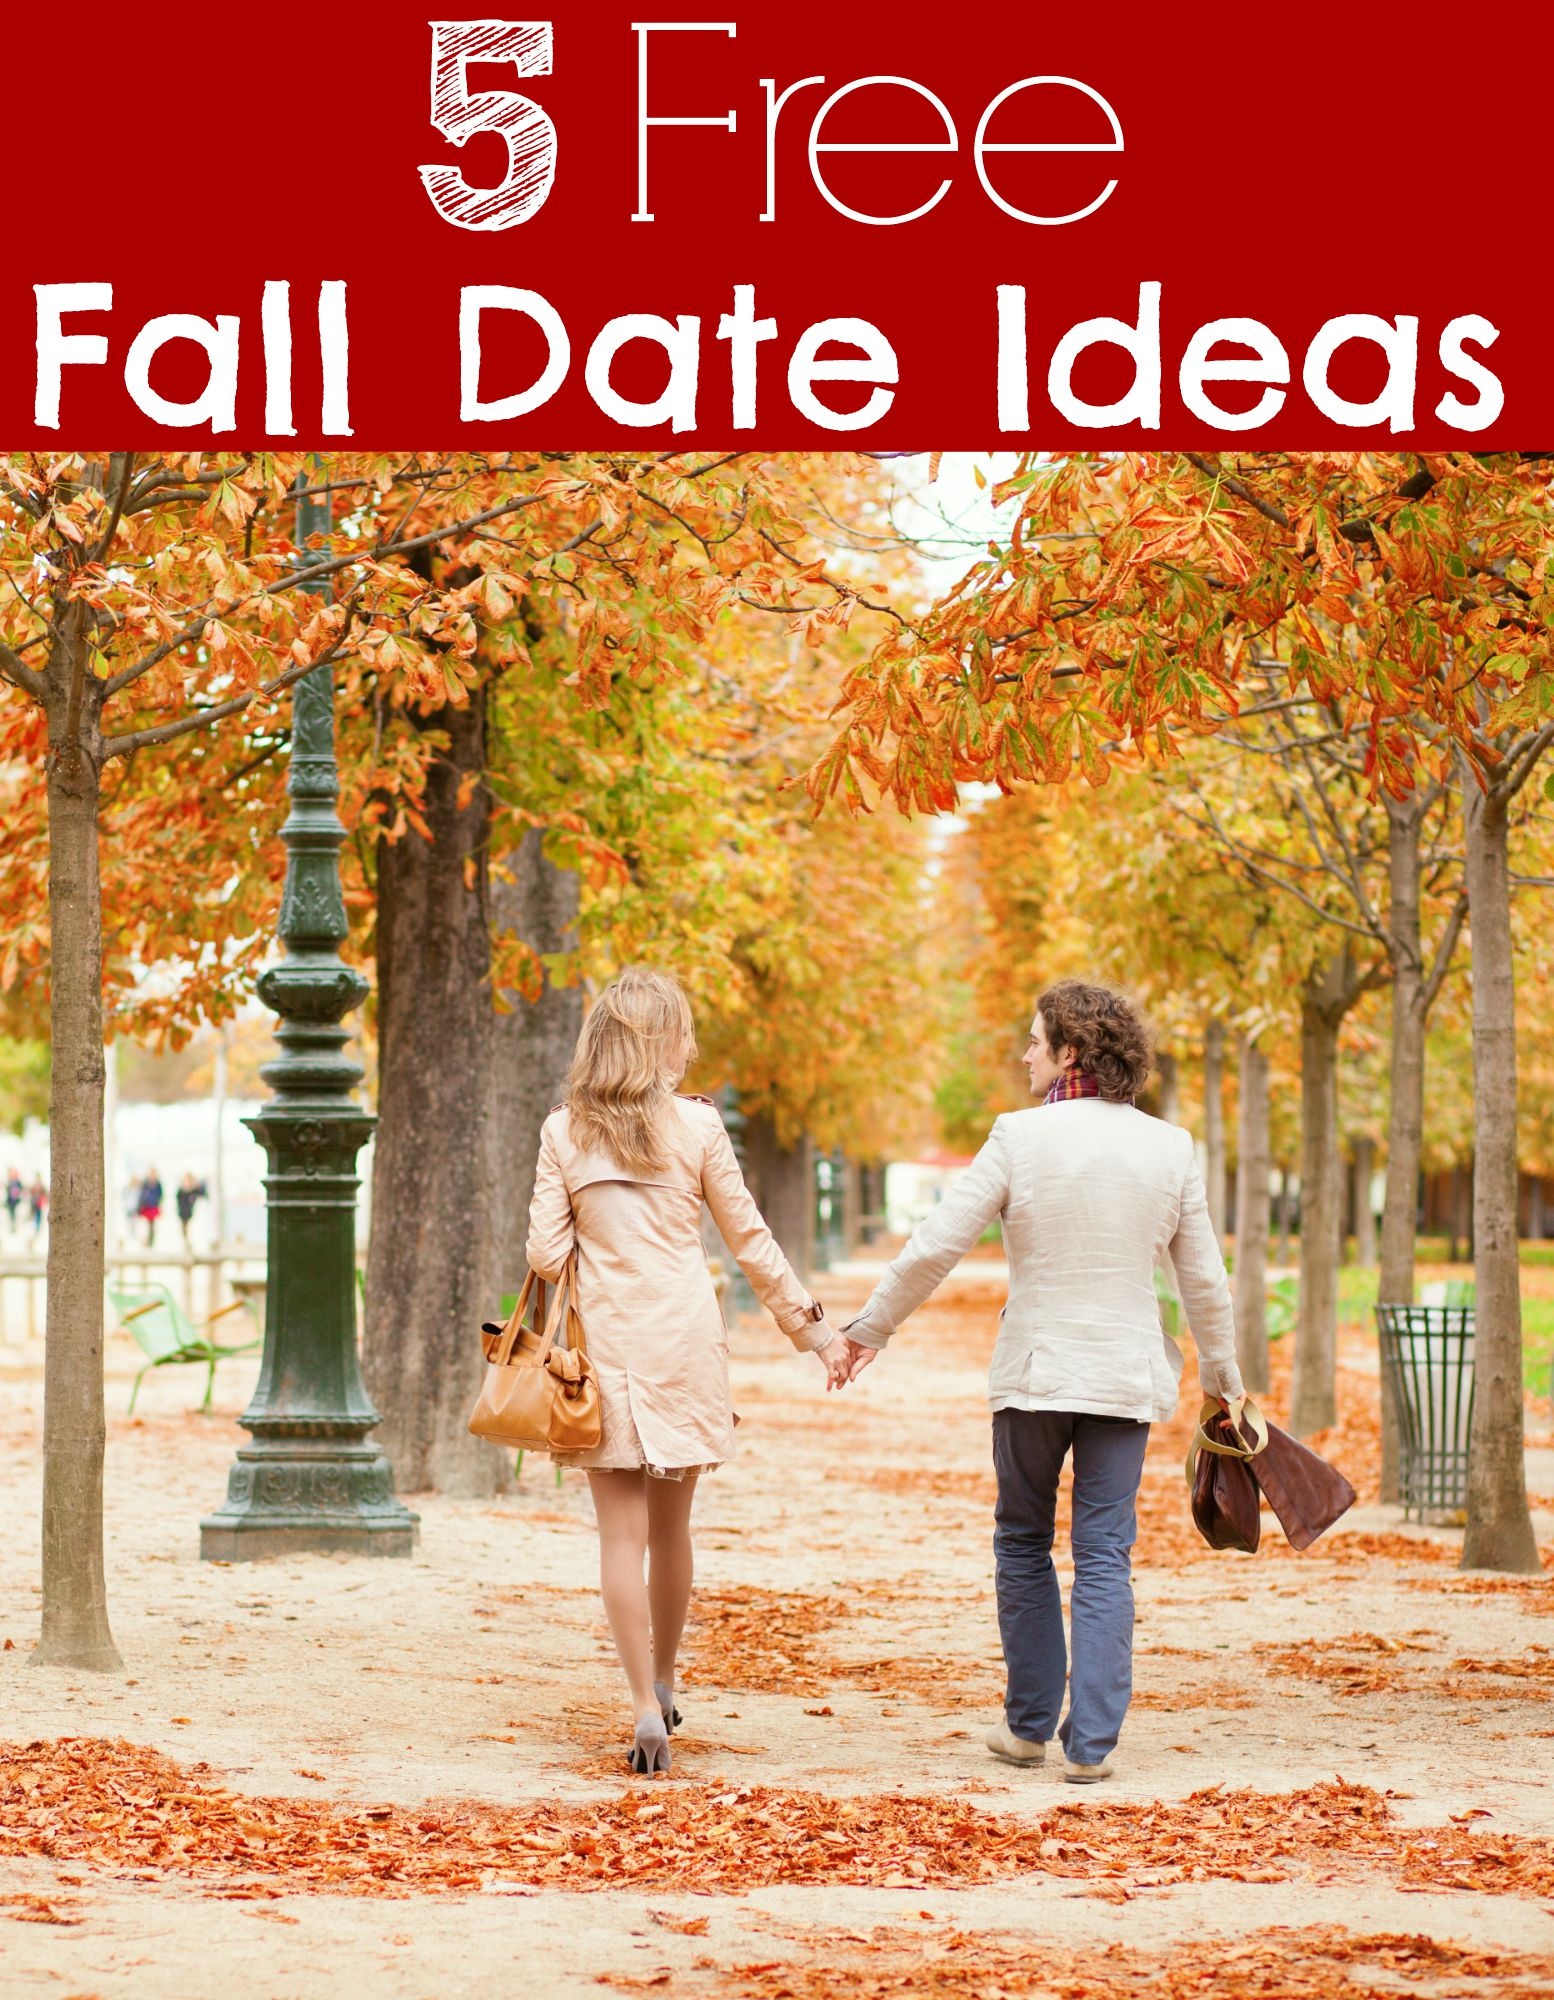 Free or Cheap Fall Date Ideas